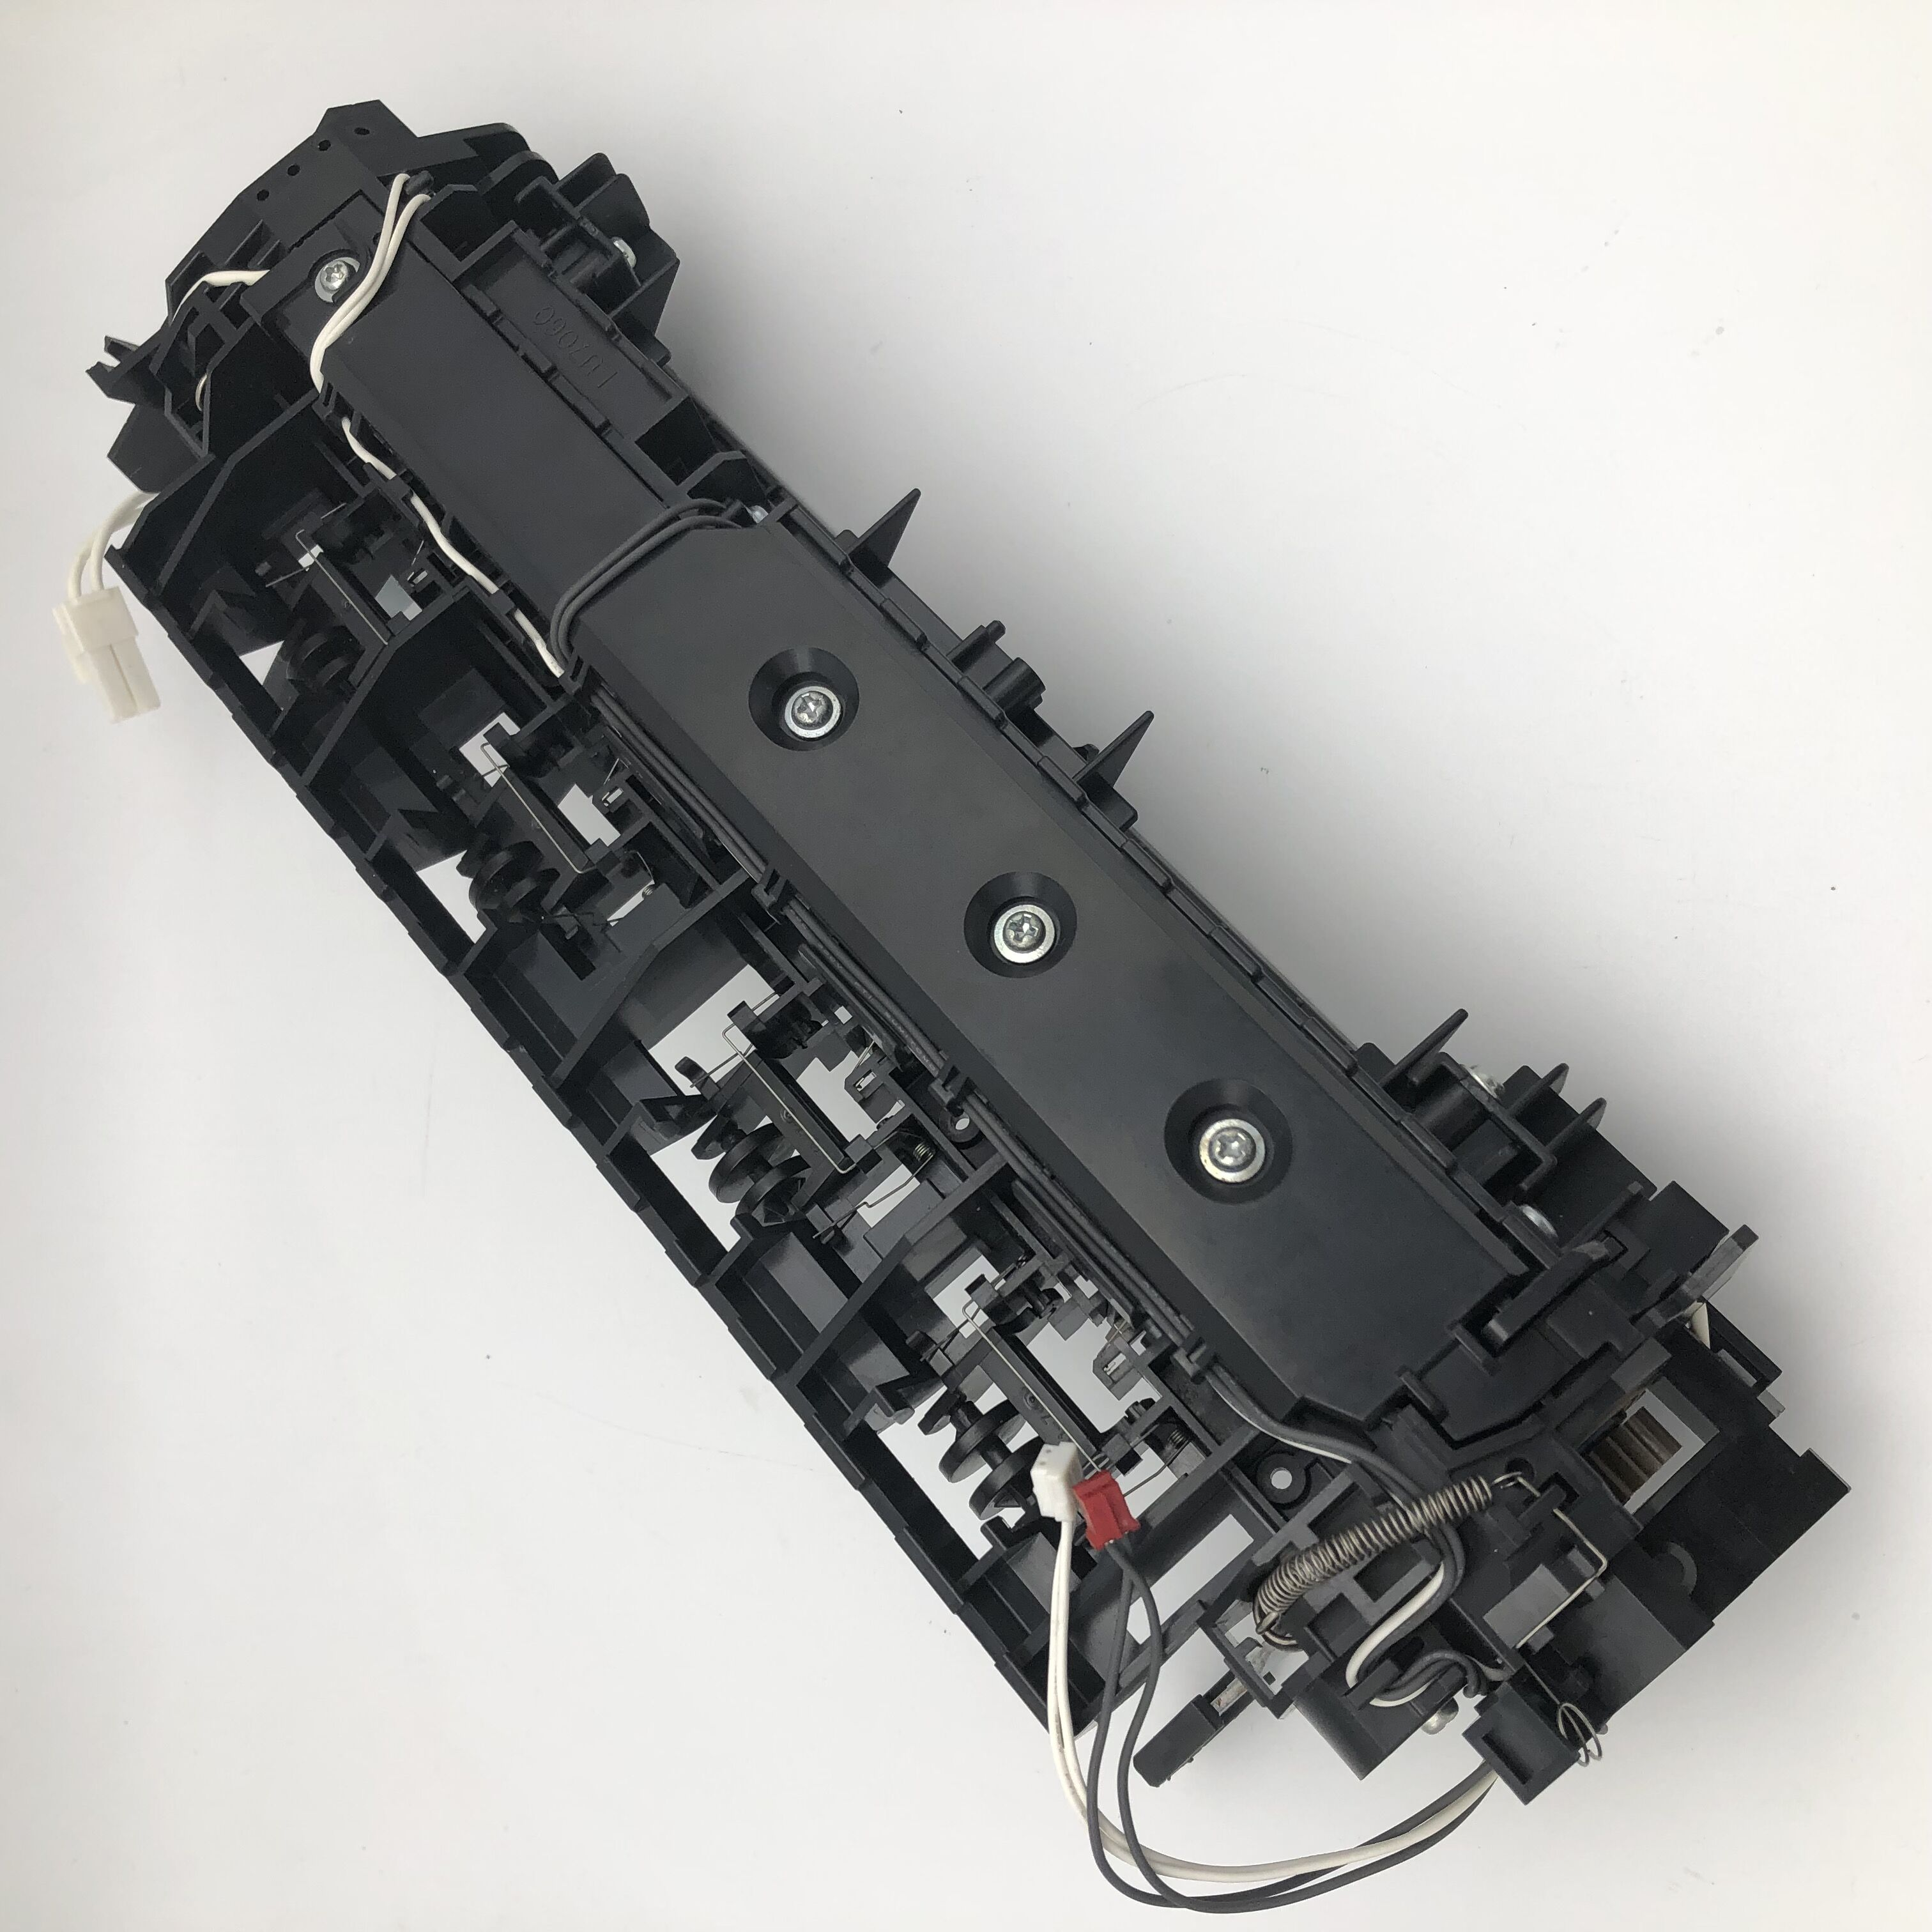 Einkshop Fuser Assembly Fuser Unit For Brother DCP 8070D DCP 8080DN DCP 8085DN DCP 8070 8080 8085 8070D 8085DN Printer Parts     - title=